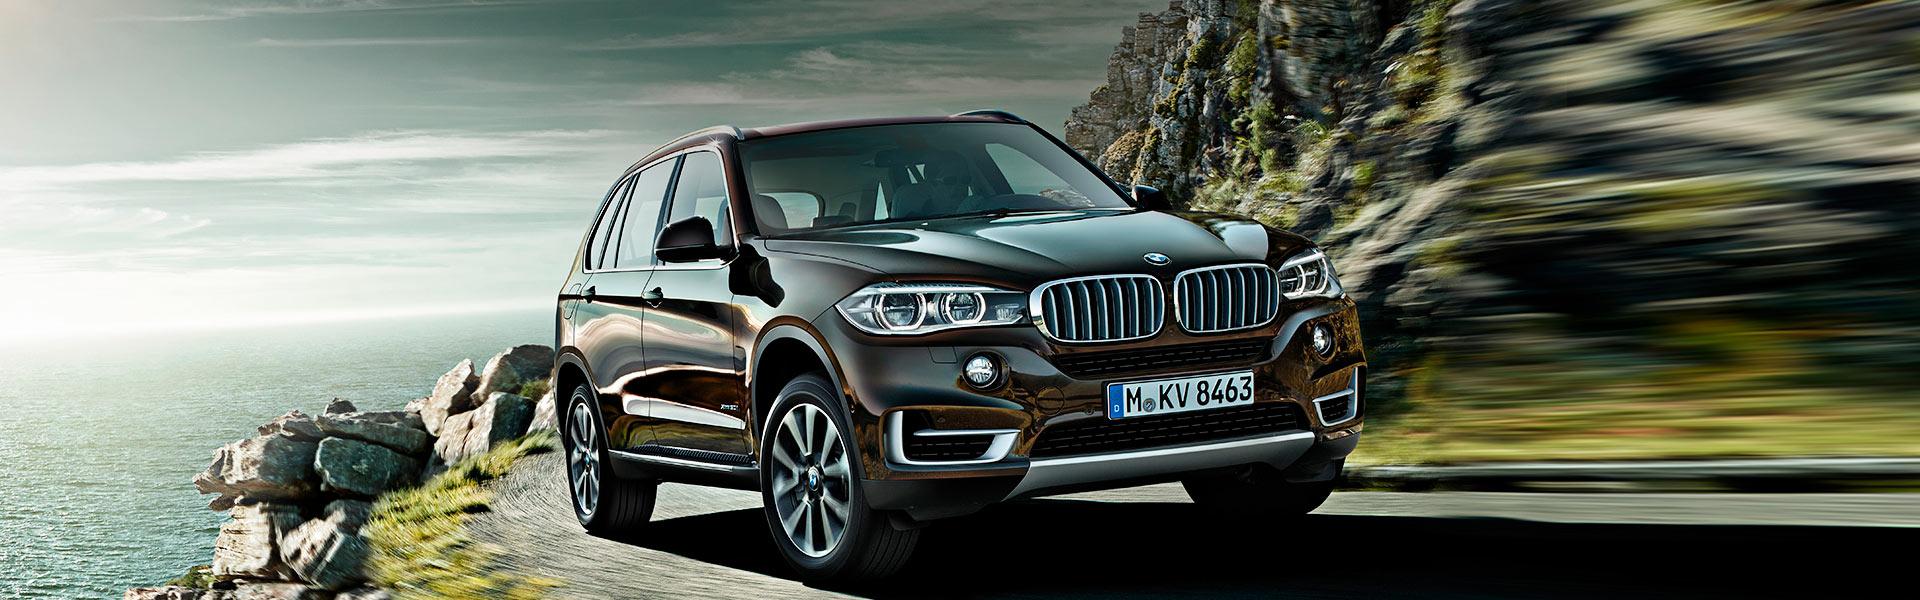 Сайлентблок на BMW X5